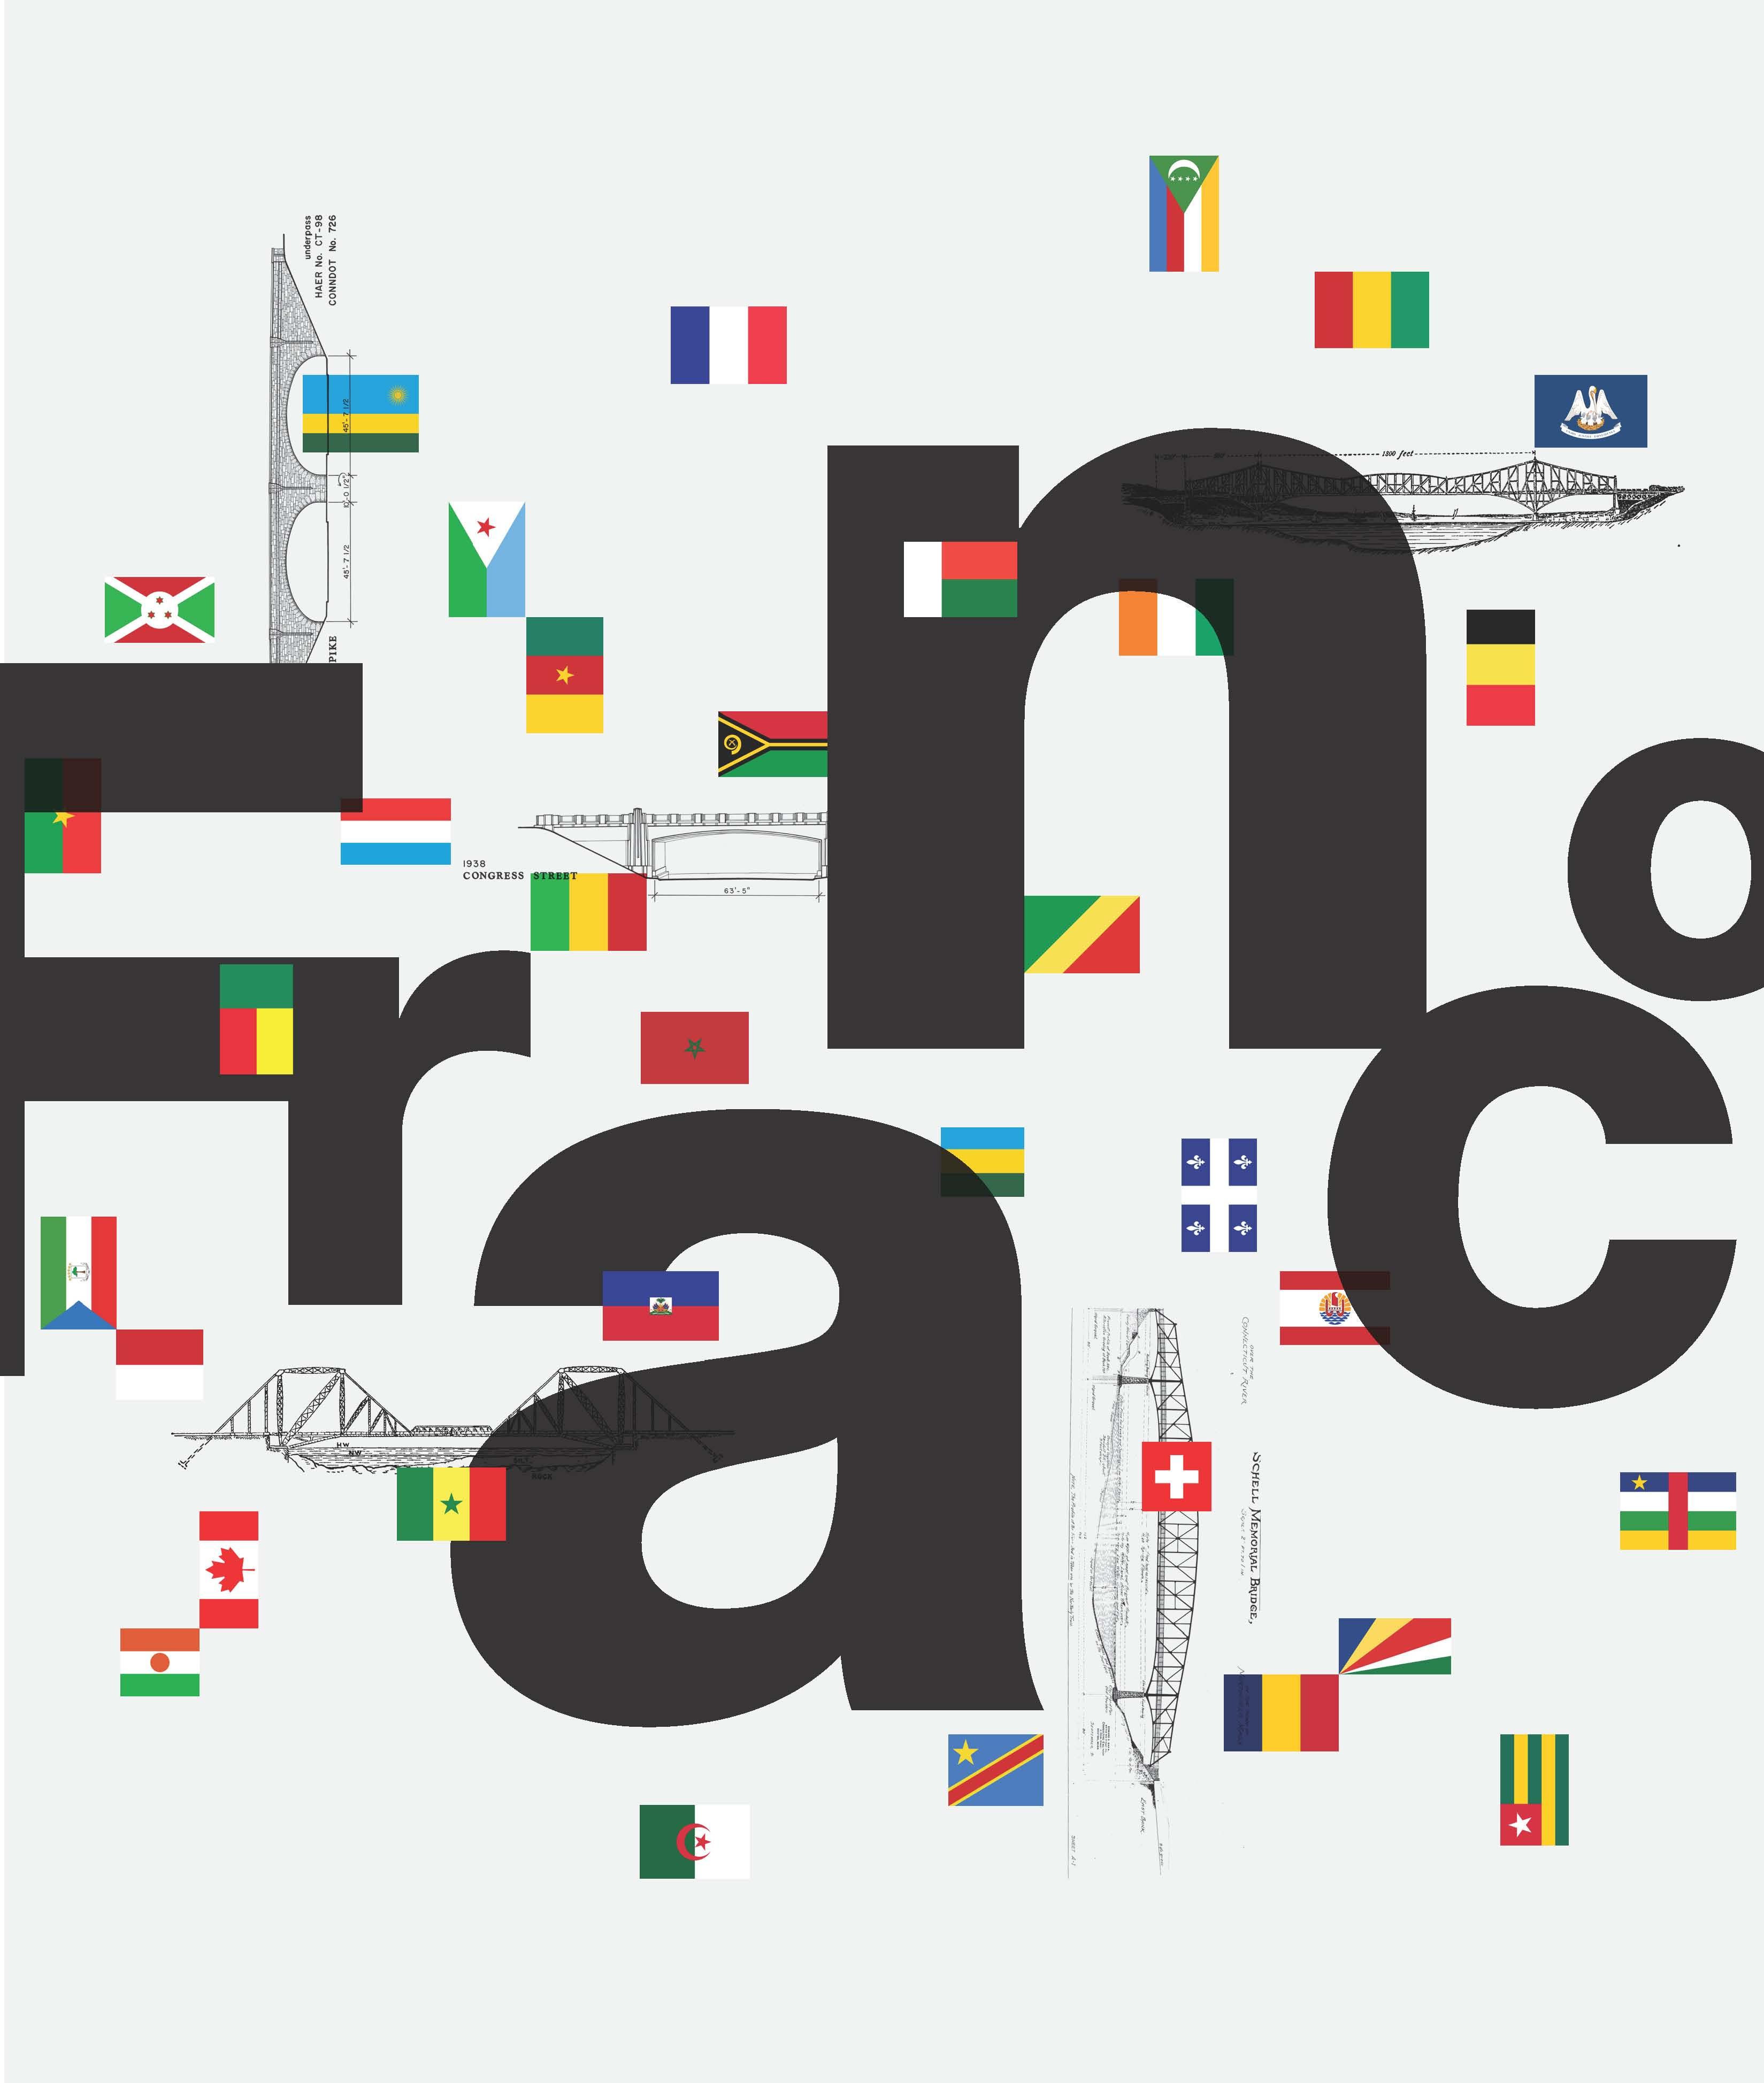 francofête logo